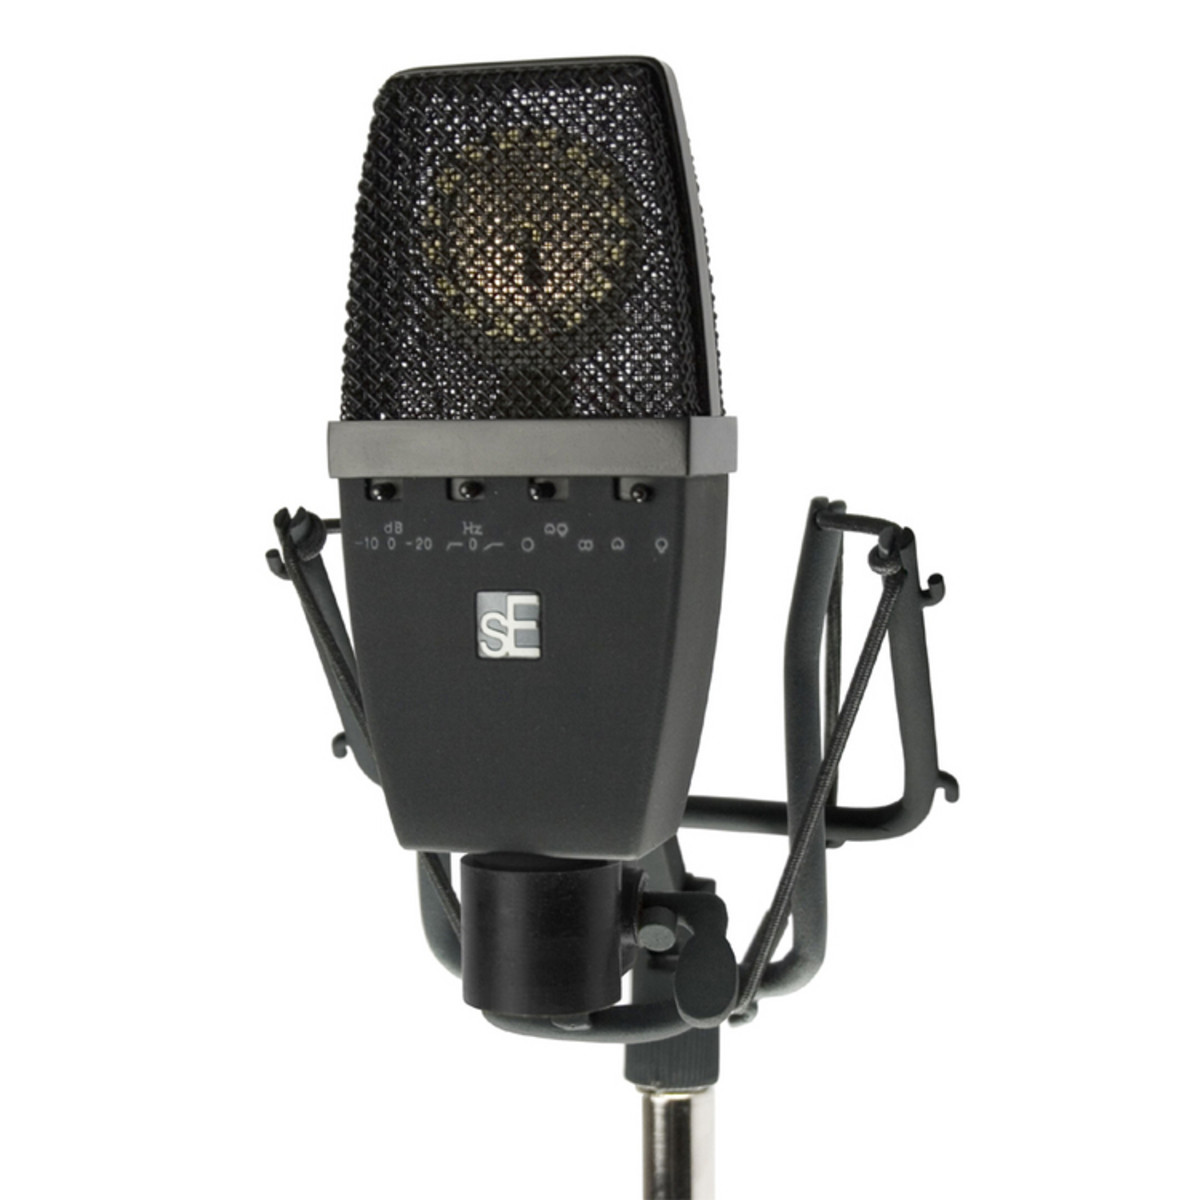 sE Electronics sE2300 Condenser Microphone | Gear4music